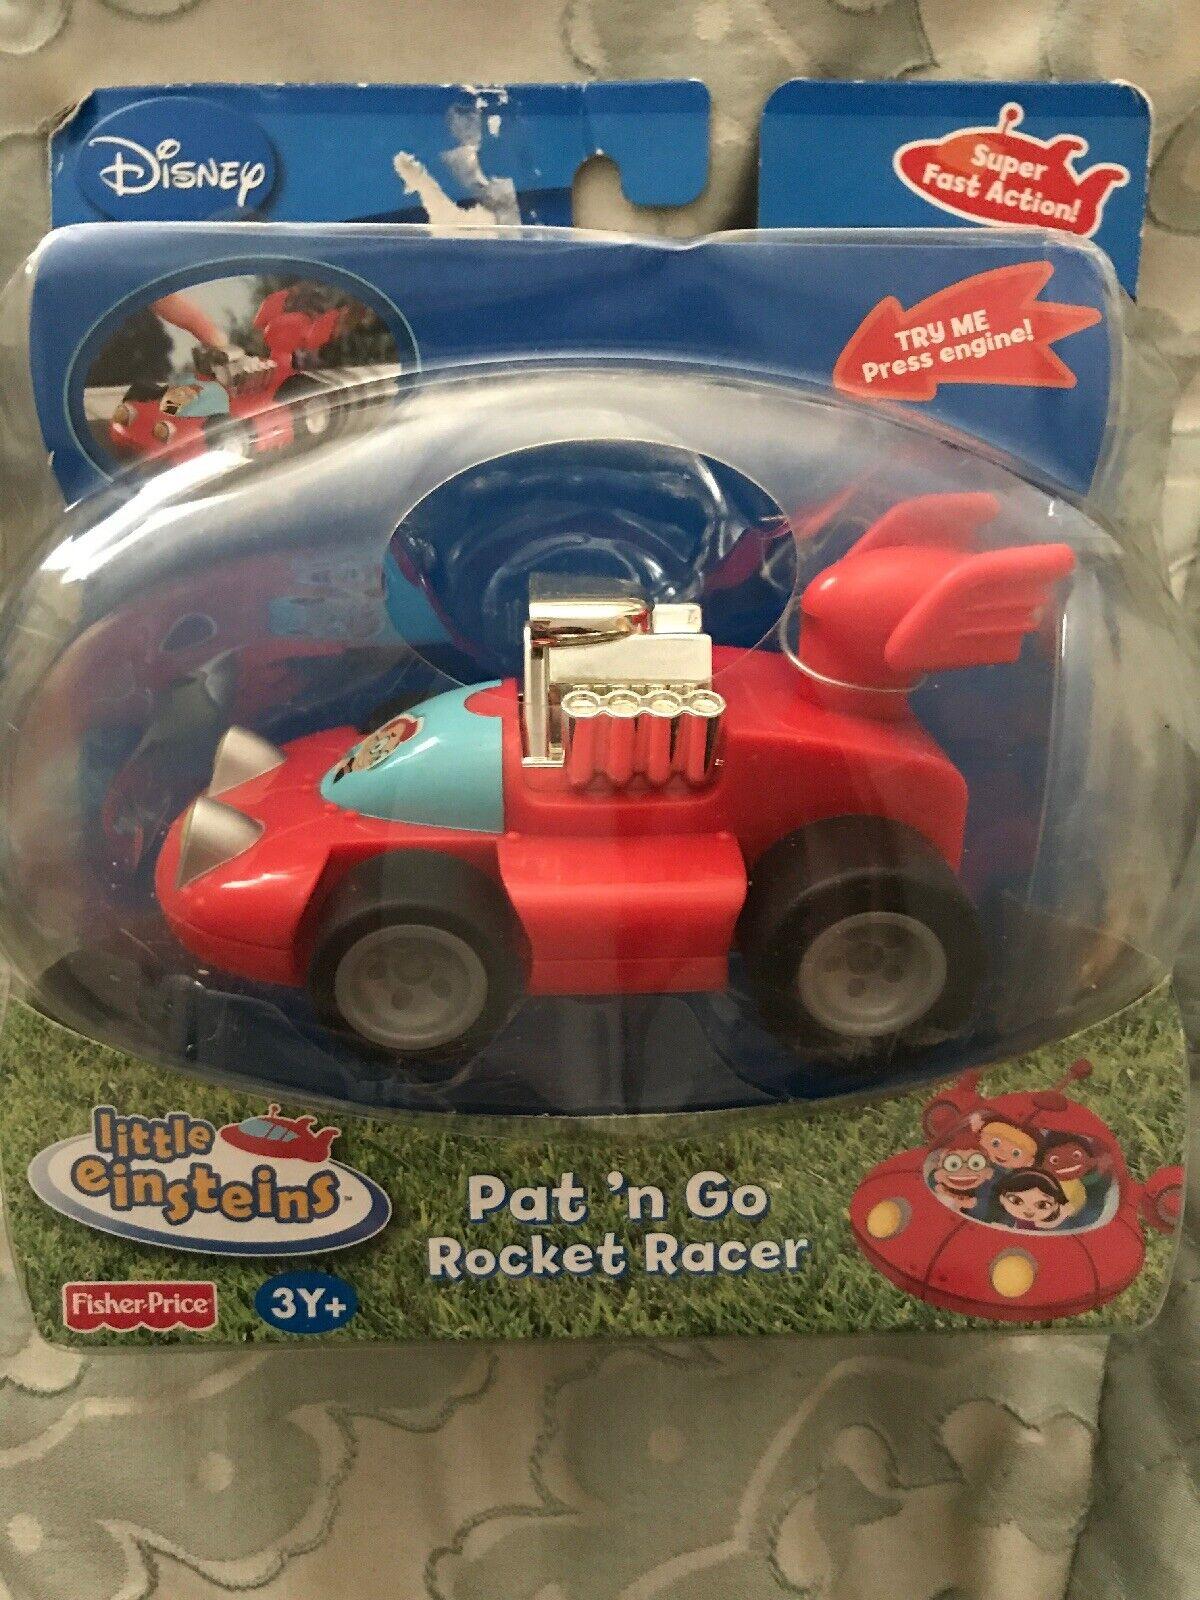 Little Einsteins Pat 'n Go Rocket rot Racer Leo Racing Car Push 'n Go Rare N7770